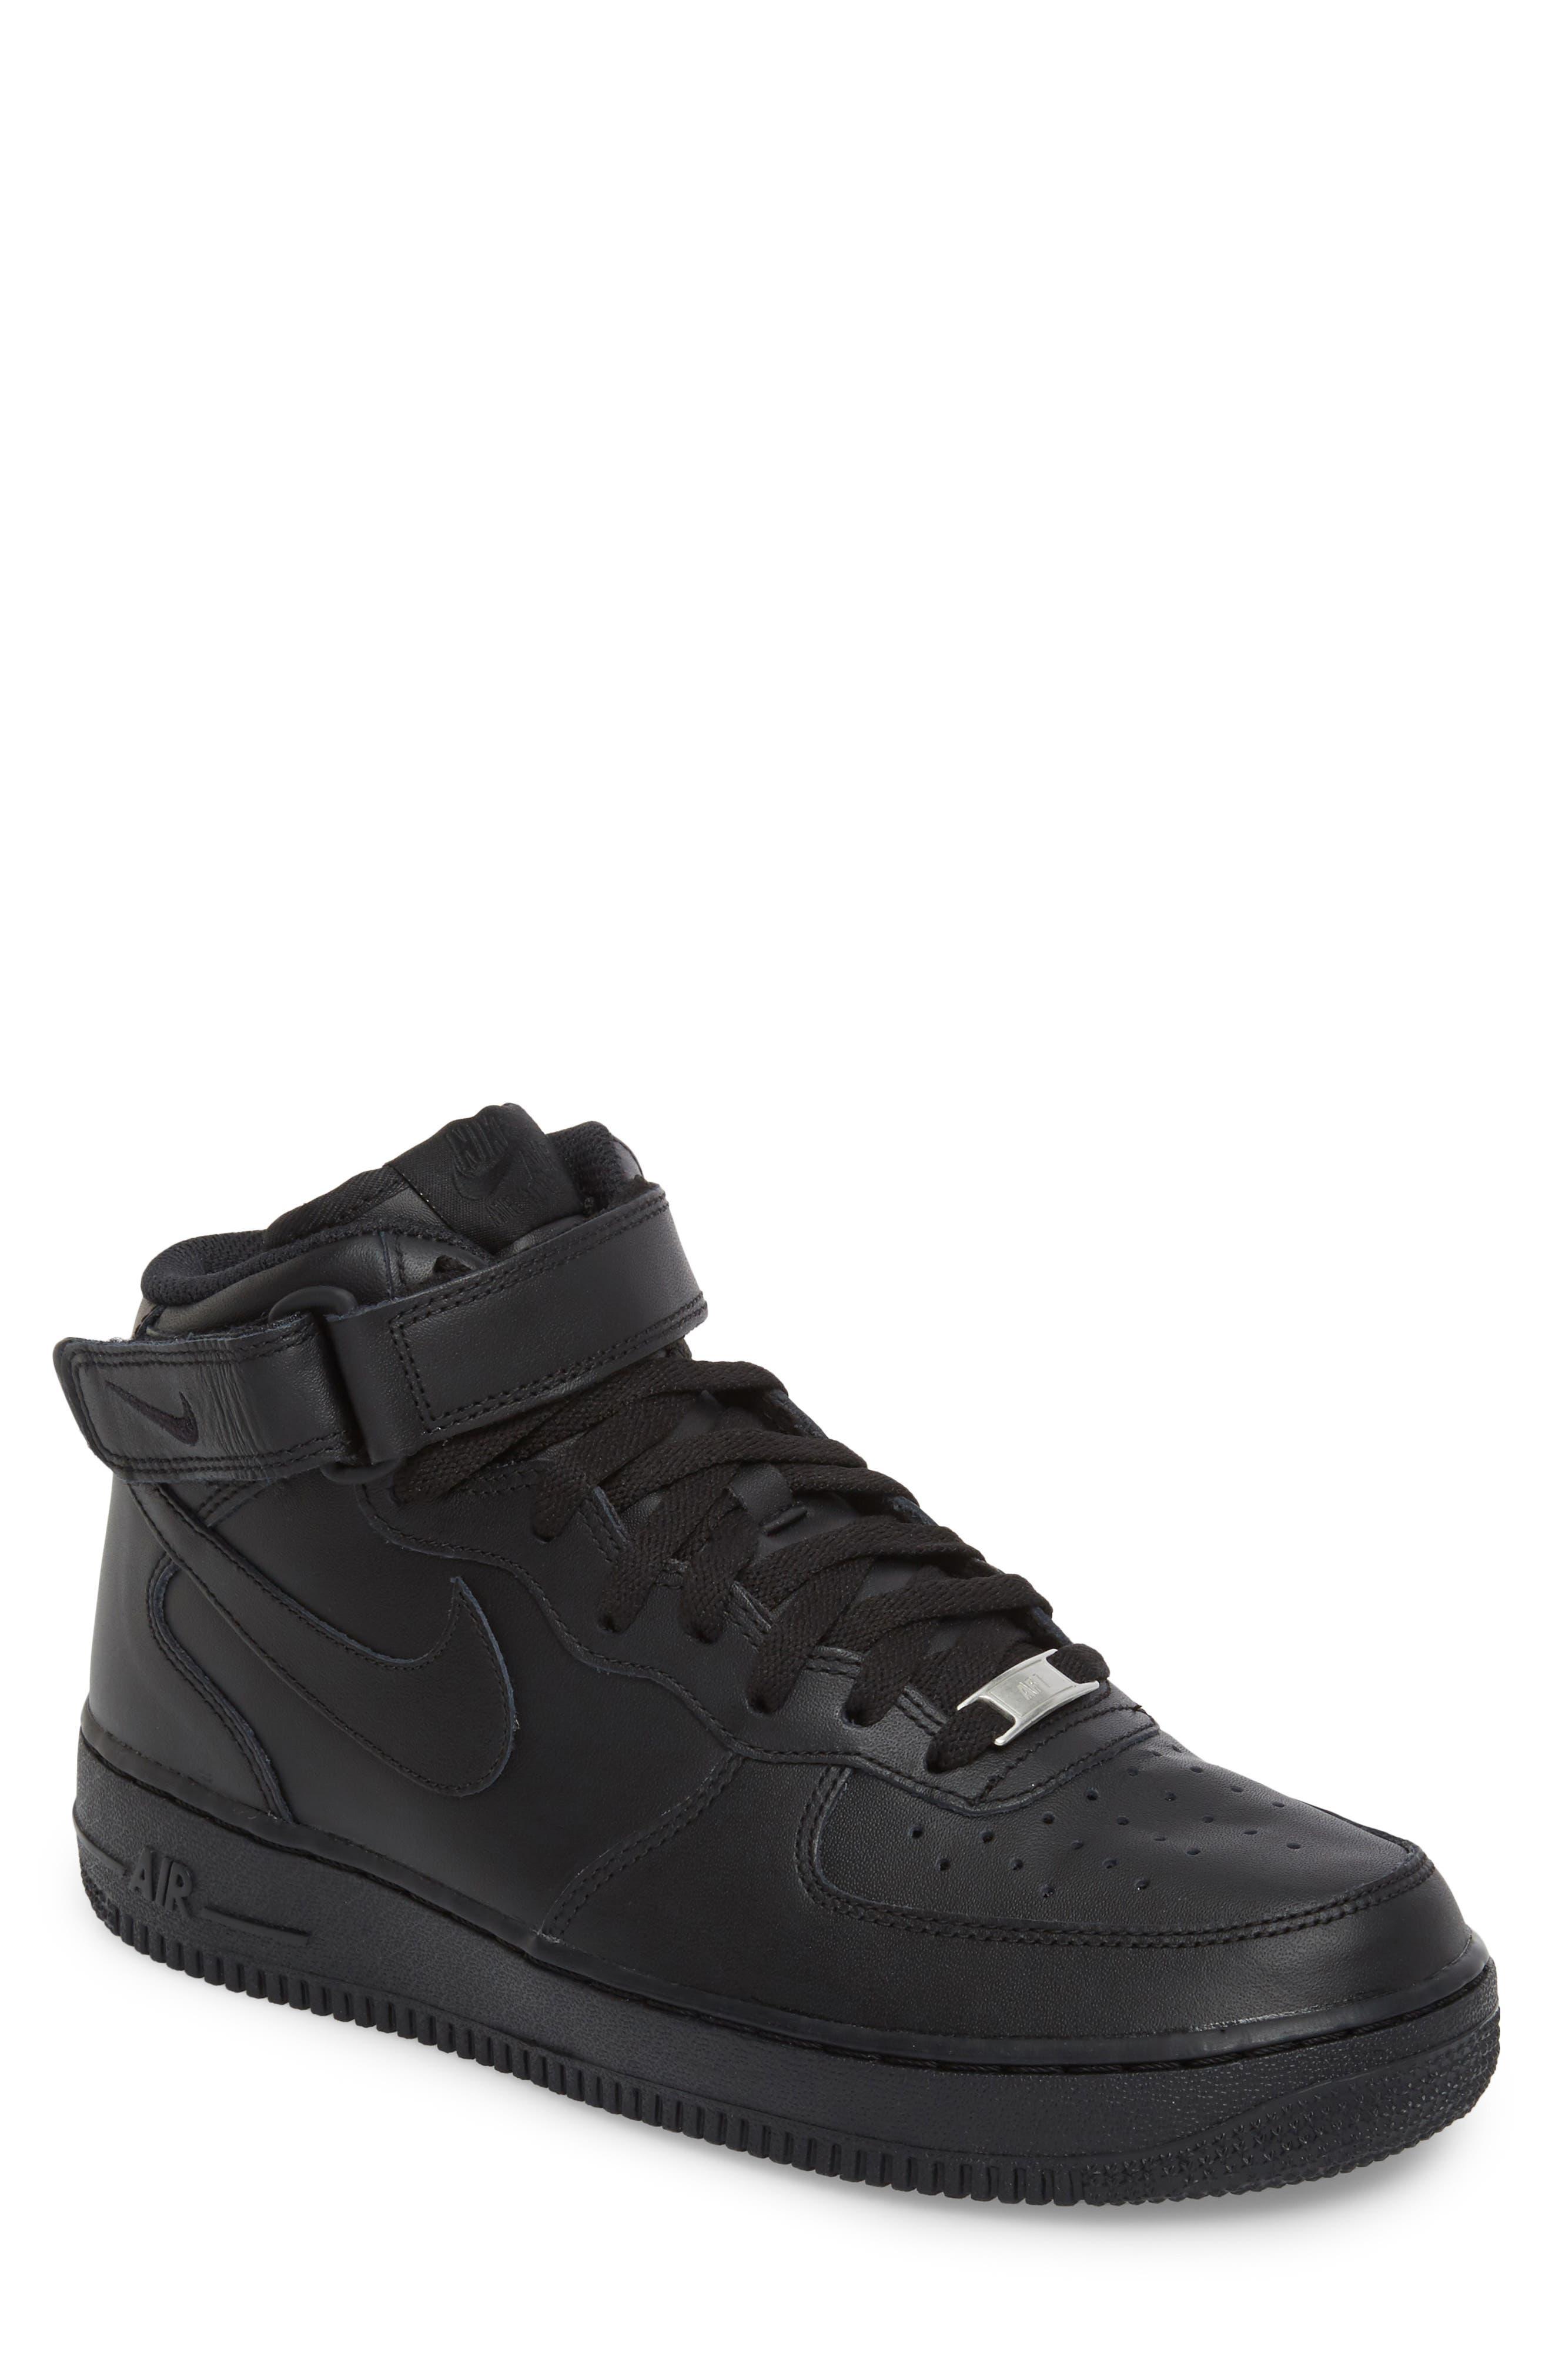 Air Force 1 Mid '07 Sneaker,                         Main,                         color, BLACK/ BLACK